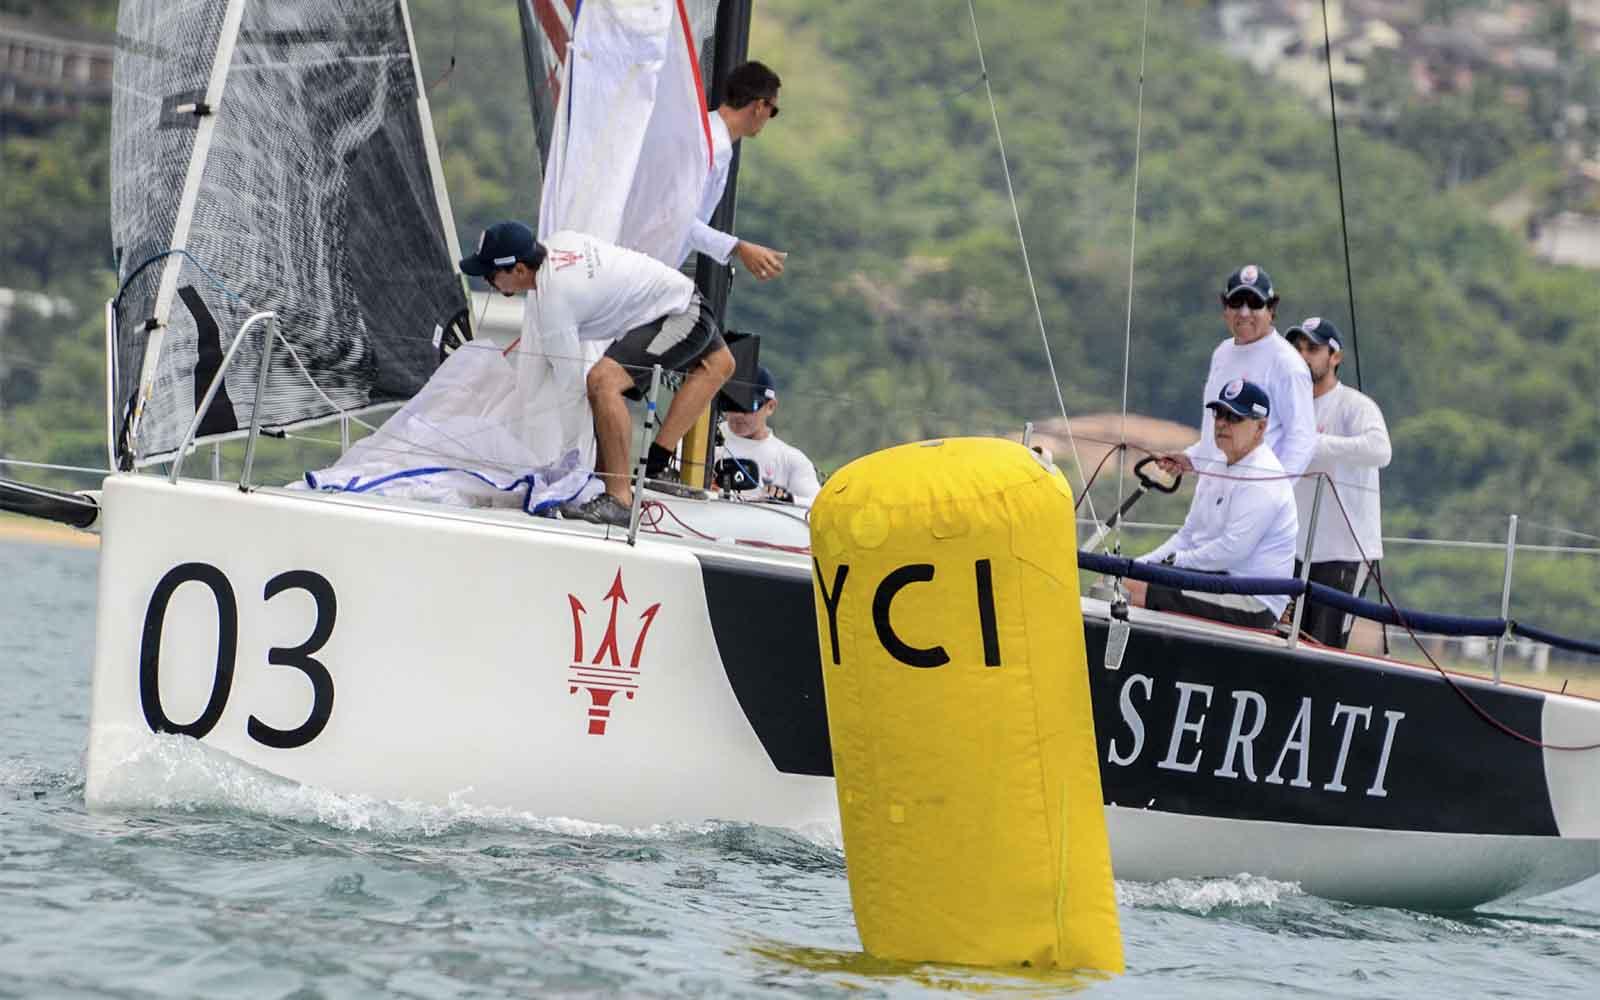 Campeão Kaikias Maserati (Aline Bassi Balaio de Ideias) - boat shopping